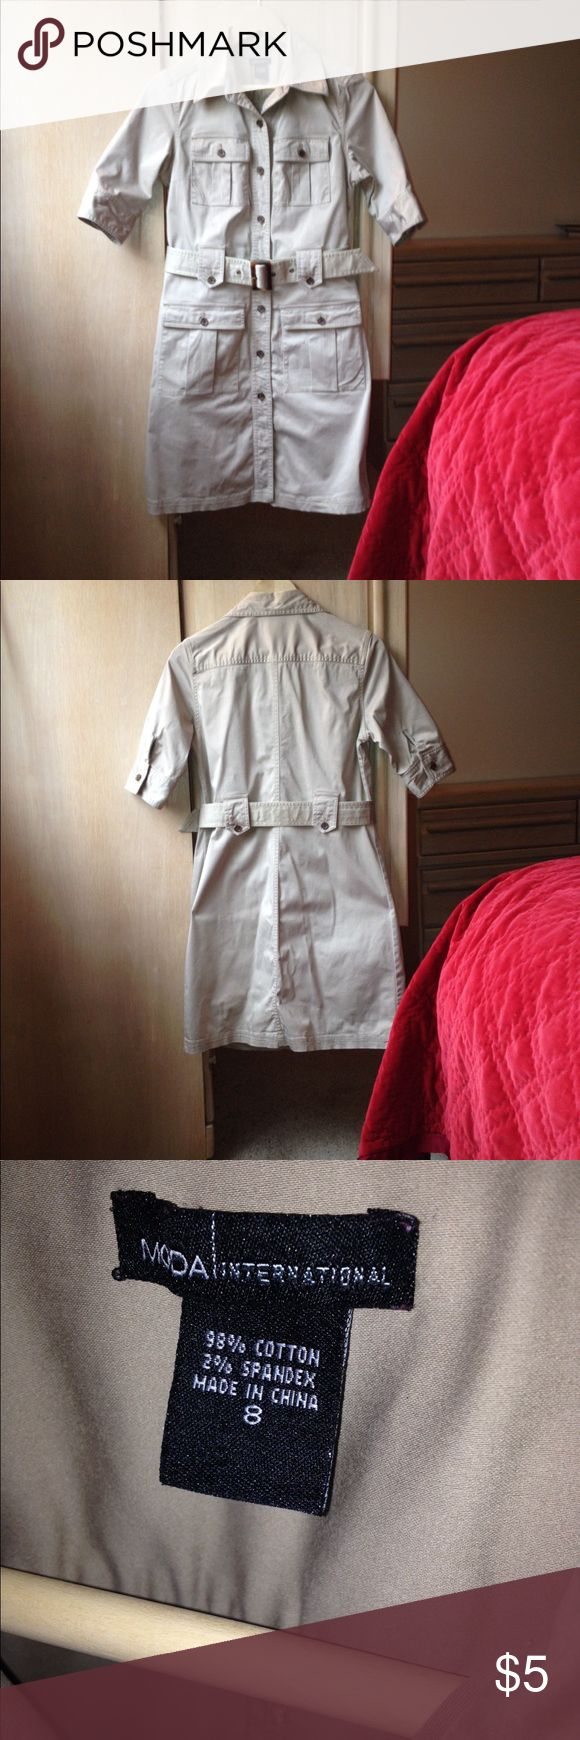 Khaki shirt dress Belted shirt dress in tan khaki structured feminine shape Moda International Dresses